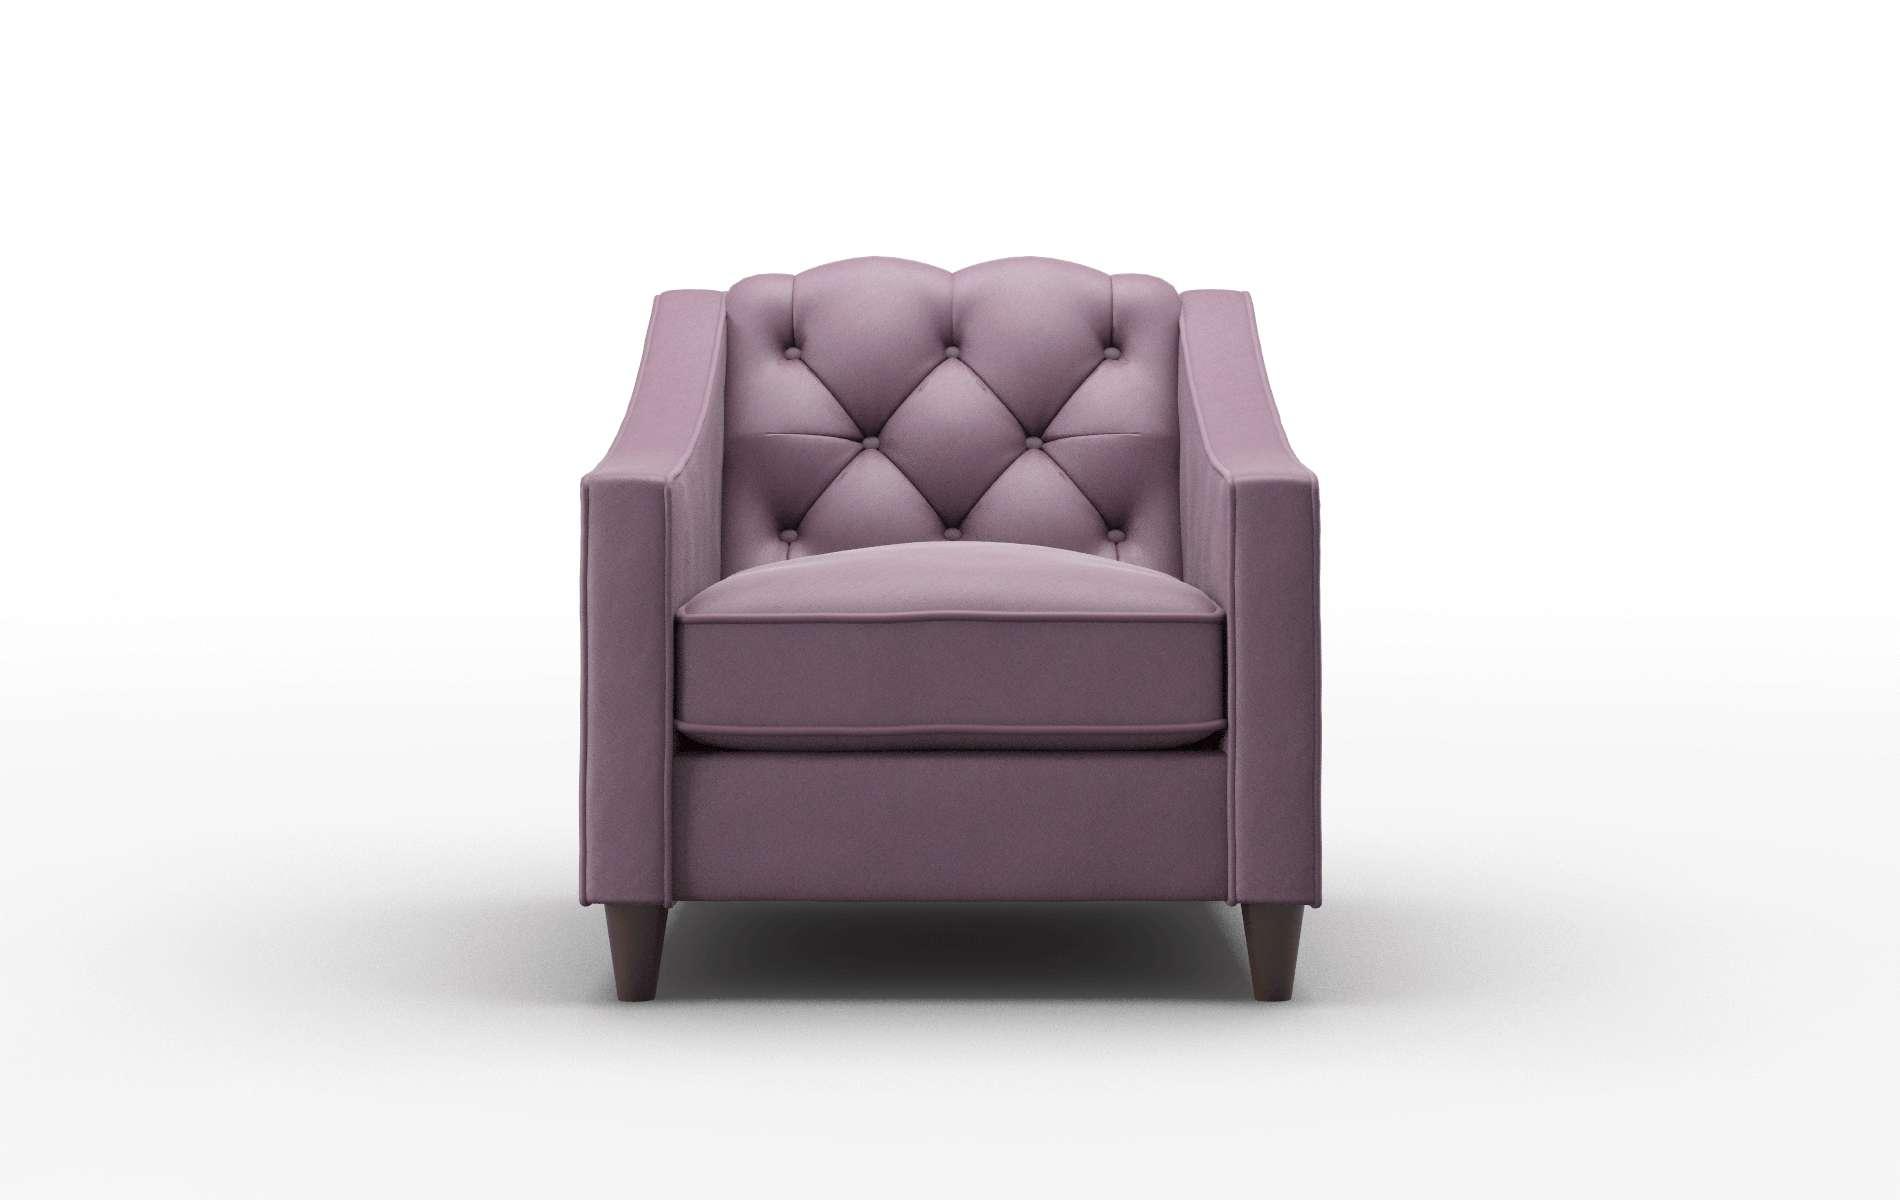 Manchester Bella Aubergine Chair espresso legs 1